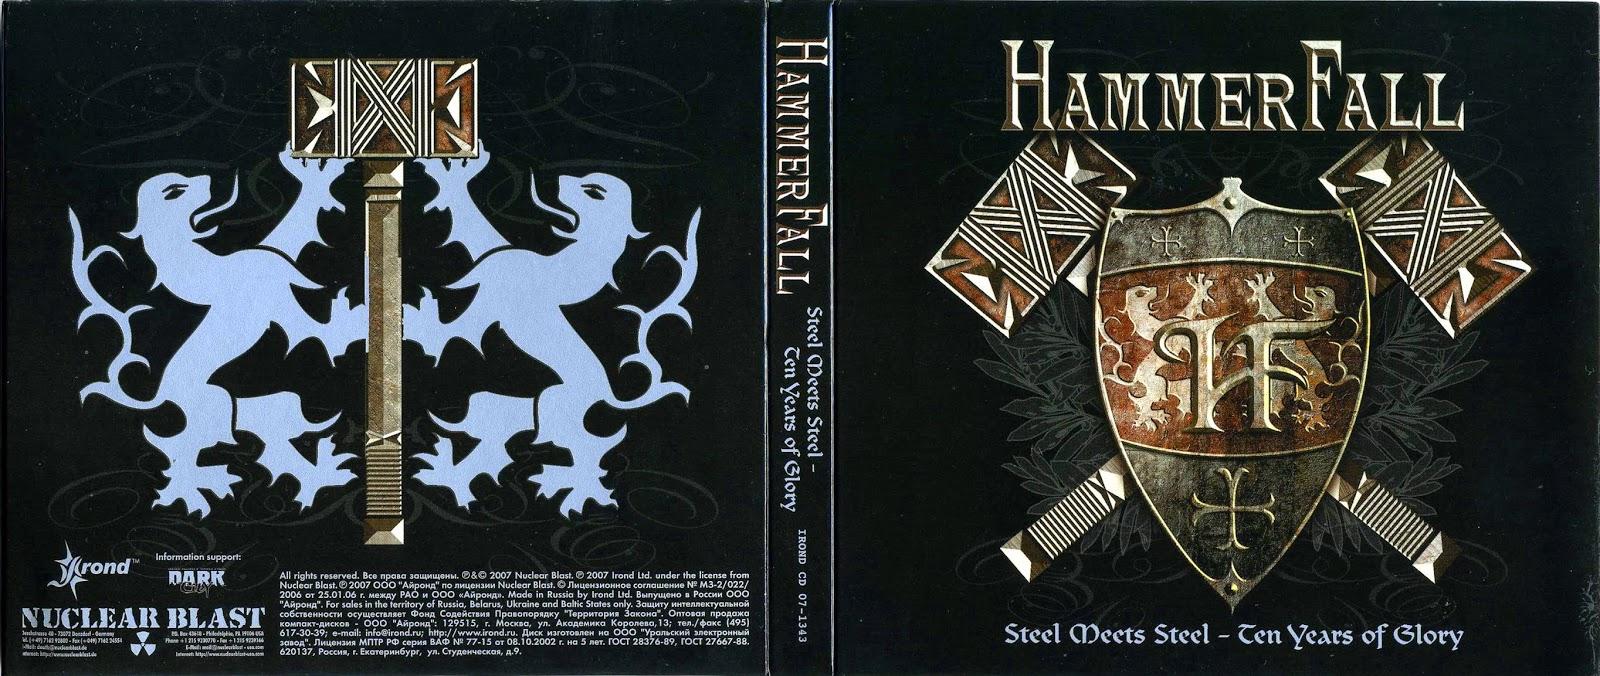 Music Life 2013: HammerFall - Steel Meets Steel - Ten Years Of Glory 2CD [APE] (2007)